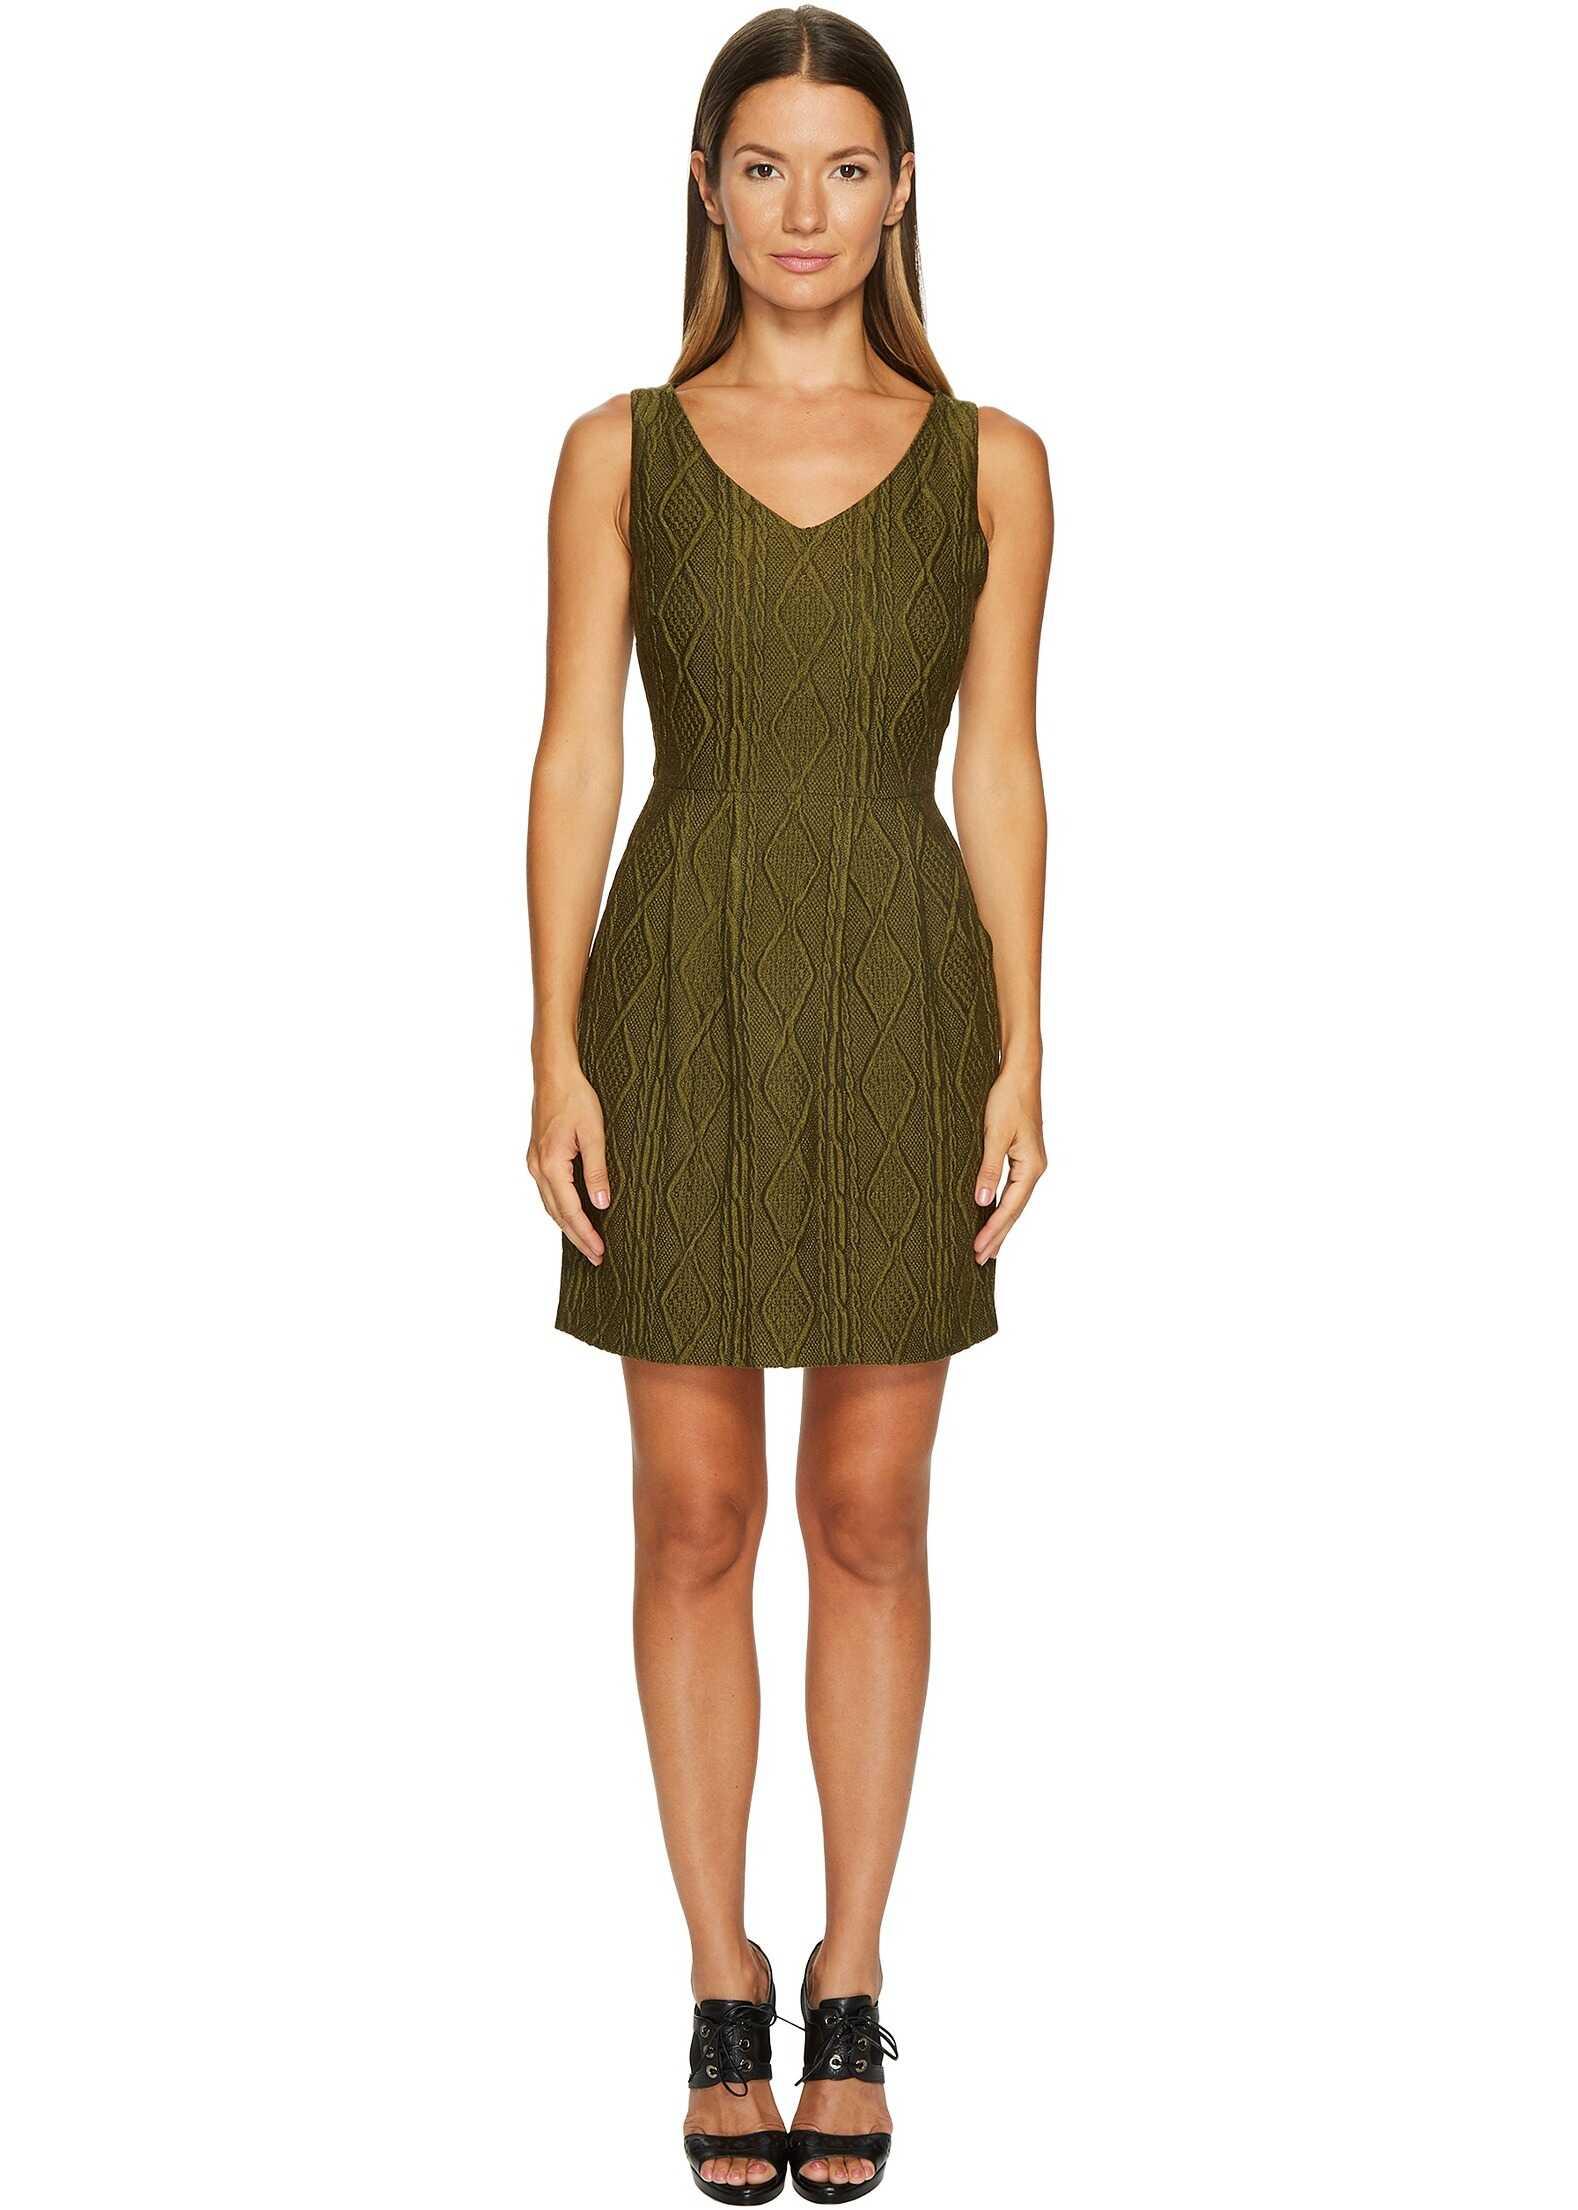 LOVE Moschino Sleeveless Knit Dress Green